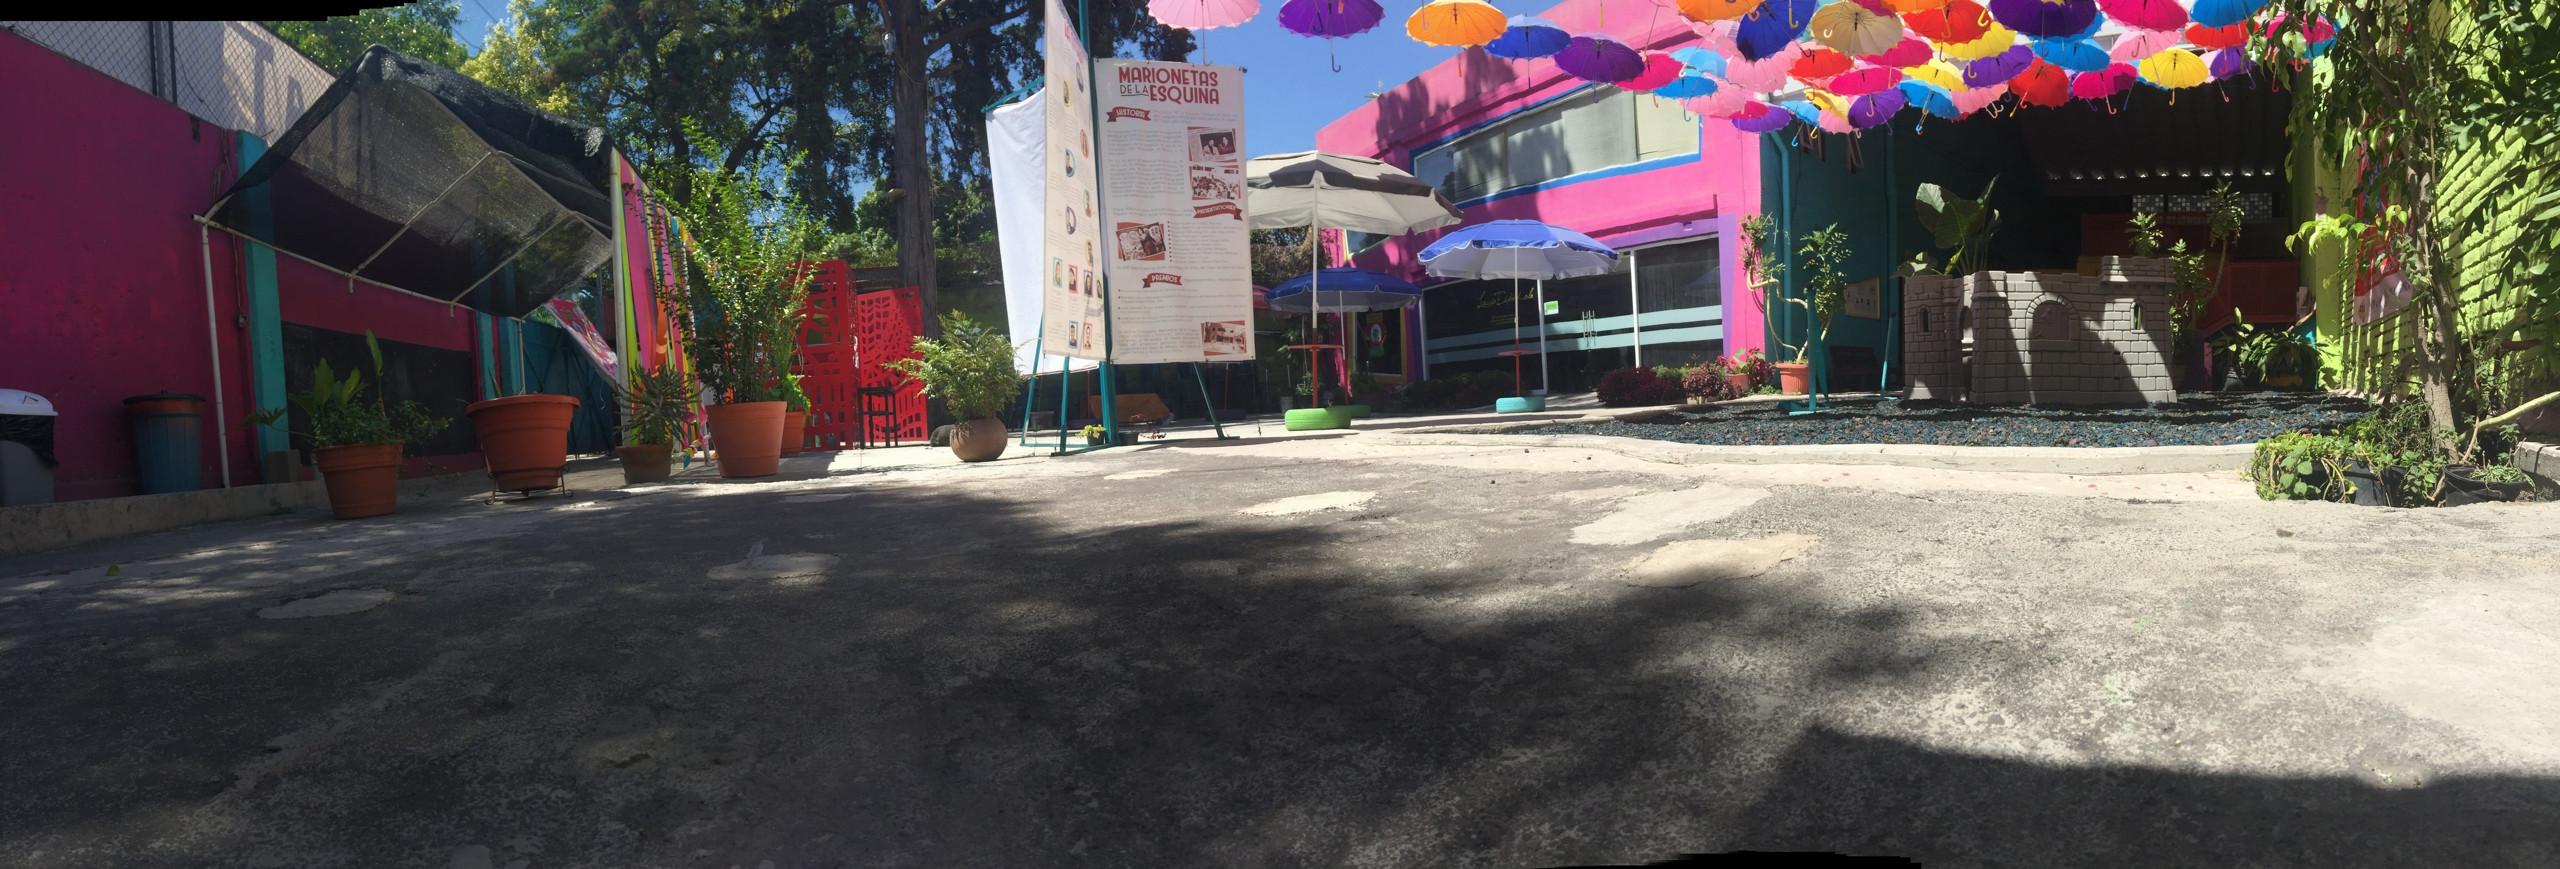 02 patio.jpg